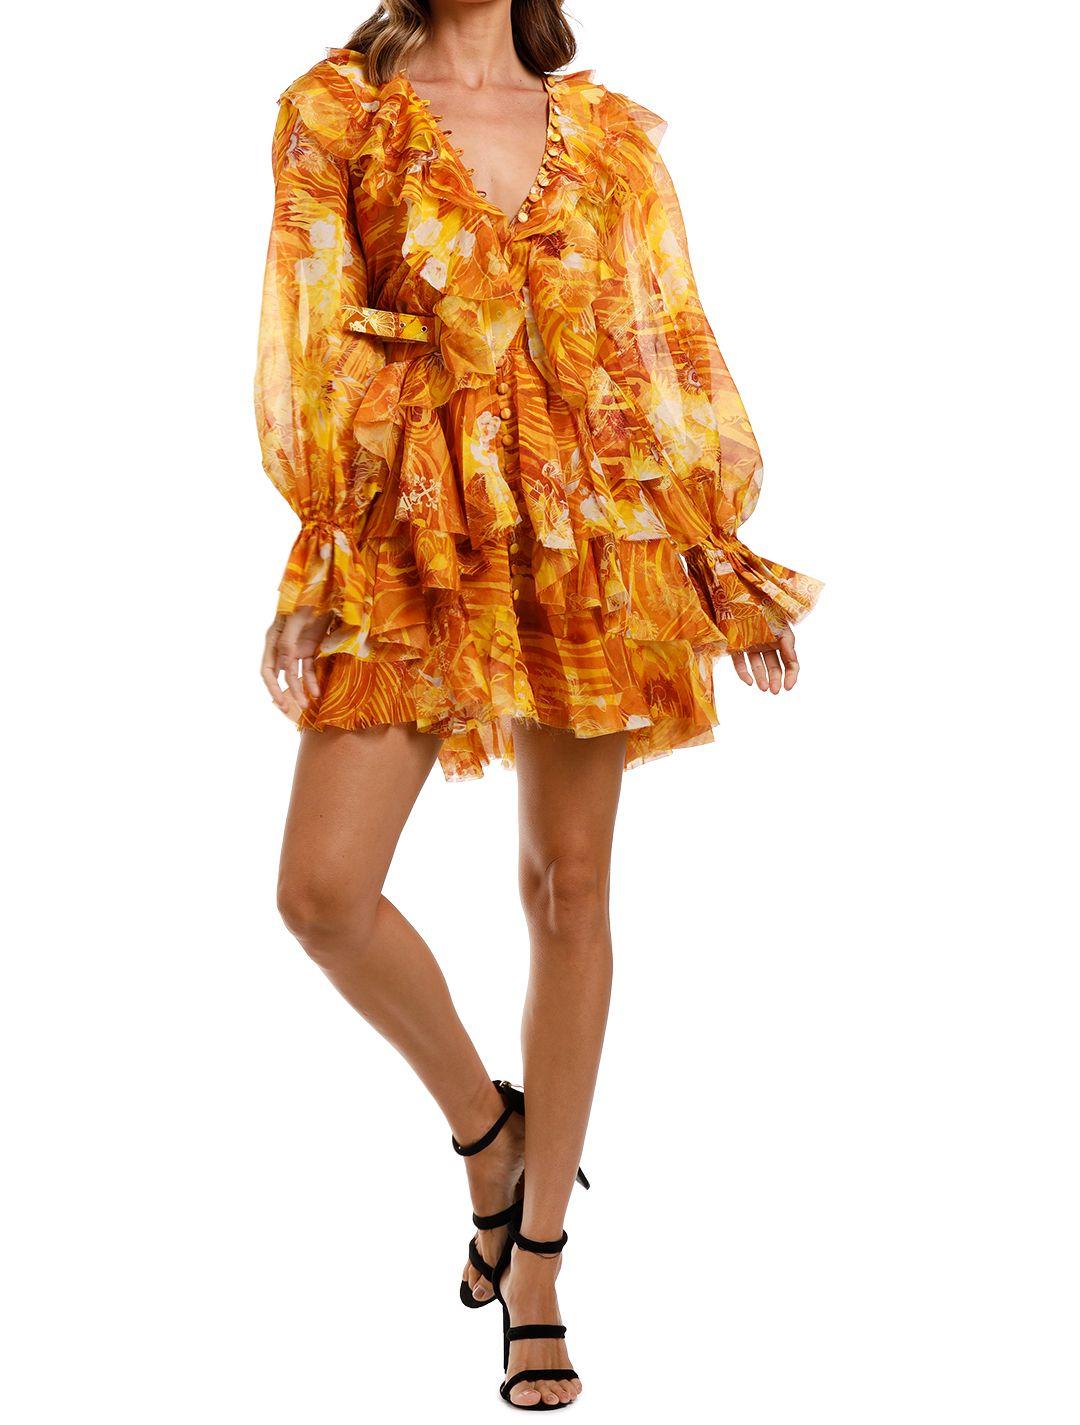 LEO & LIN The Kiss Ruffle Dress Yellow long sleeve